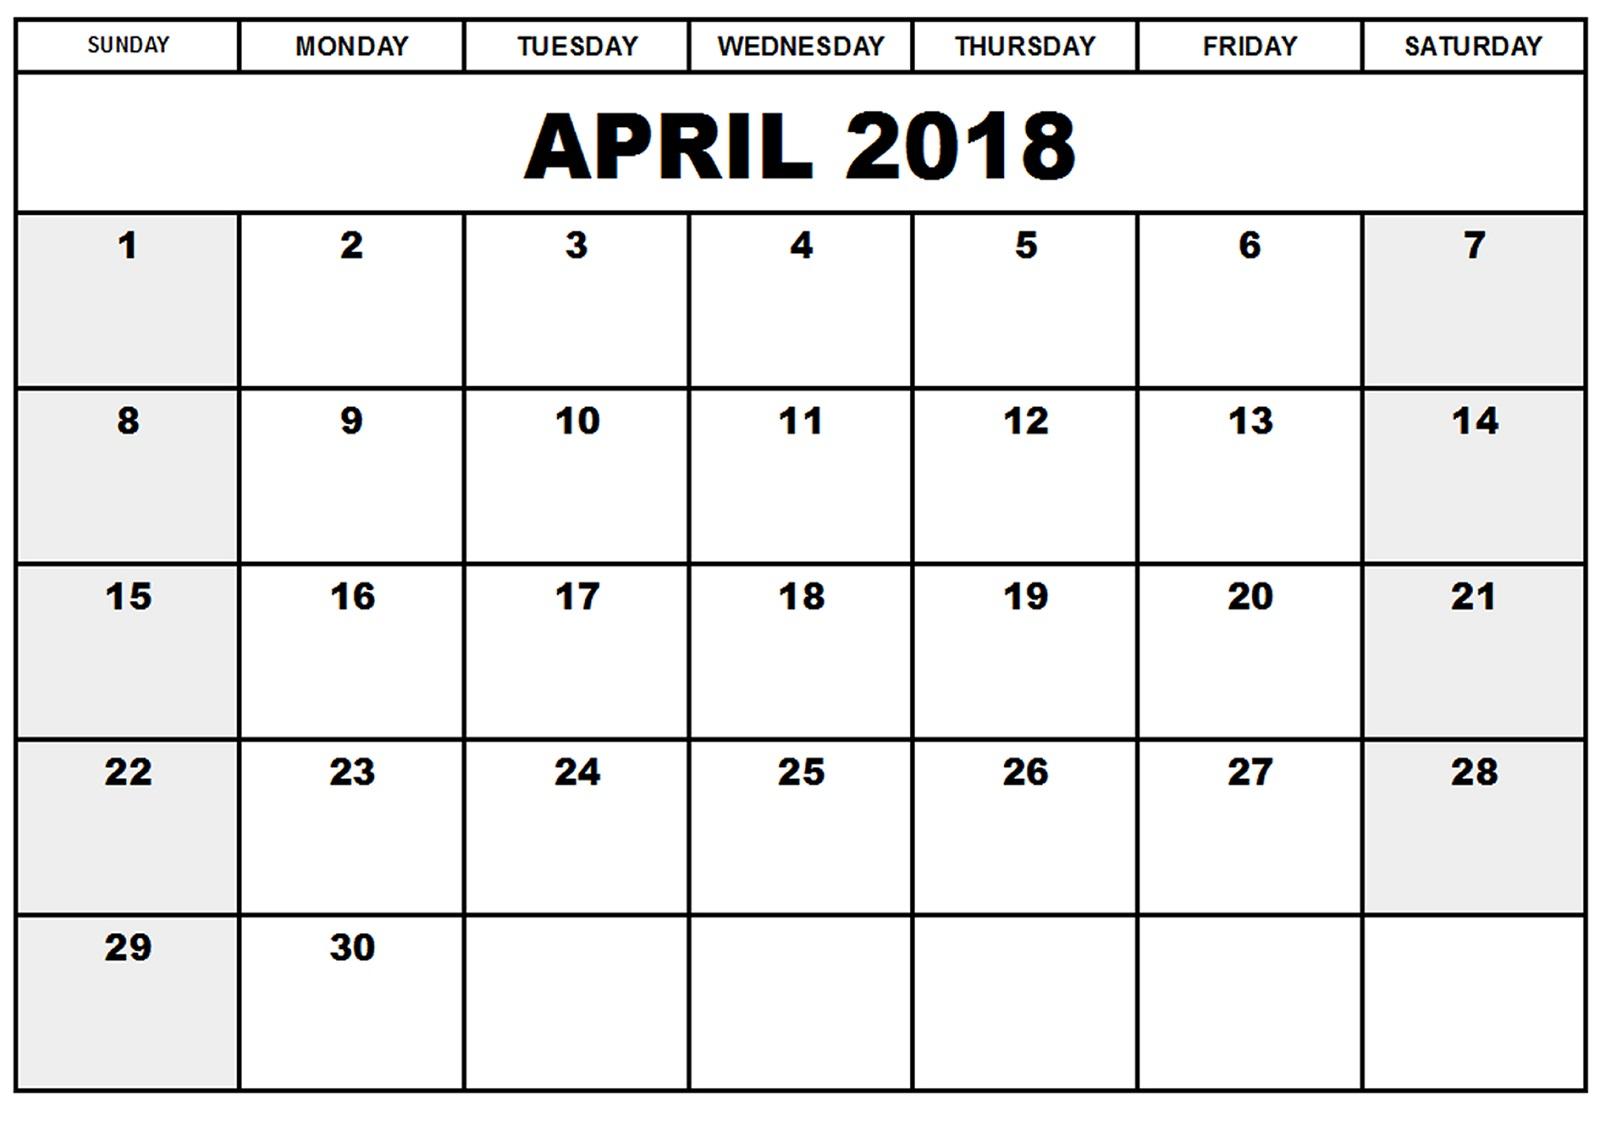 Blank February Calendar 2018 Editable   Whatisthedatetoday.Com